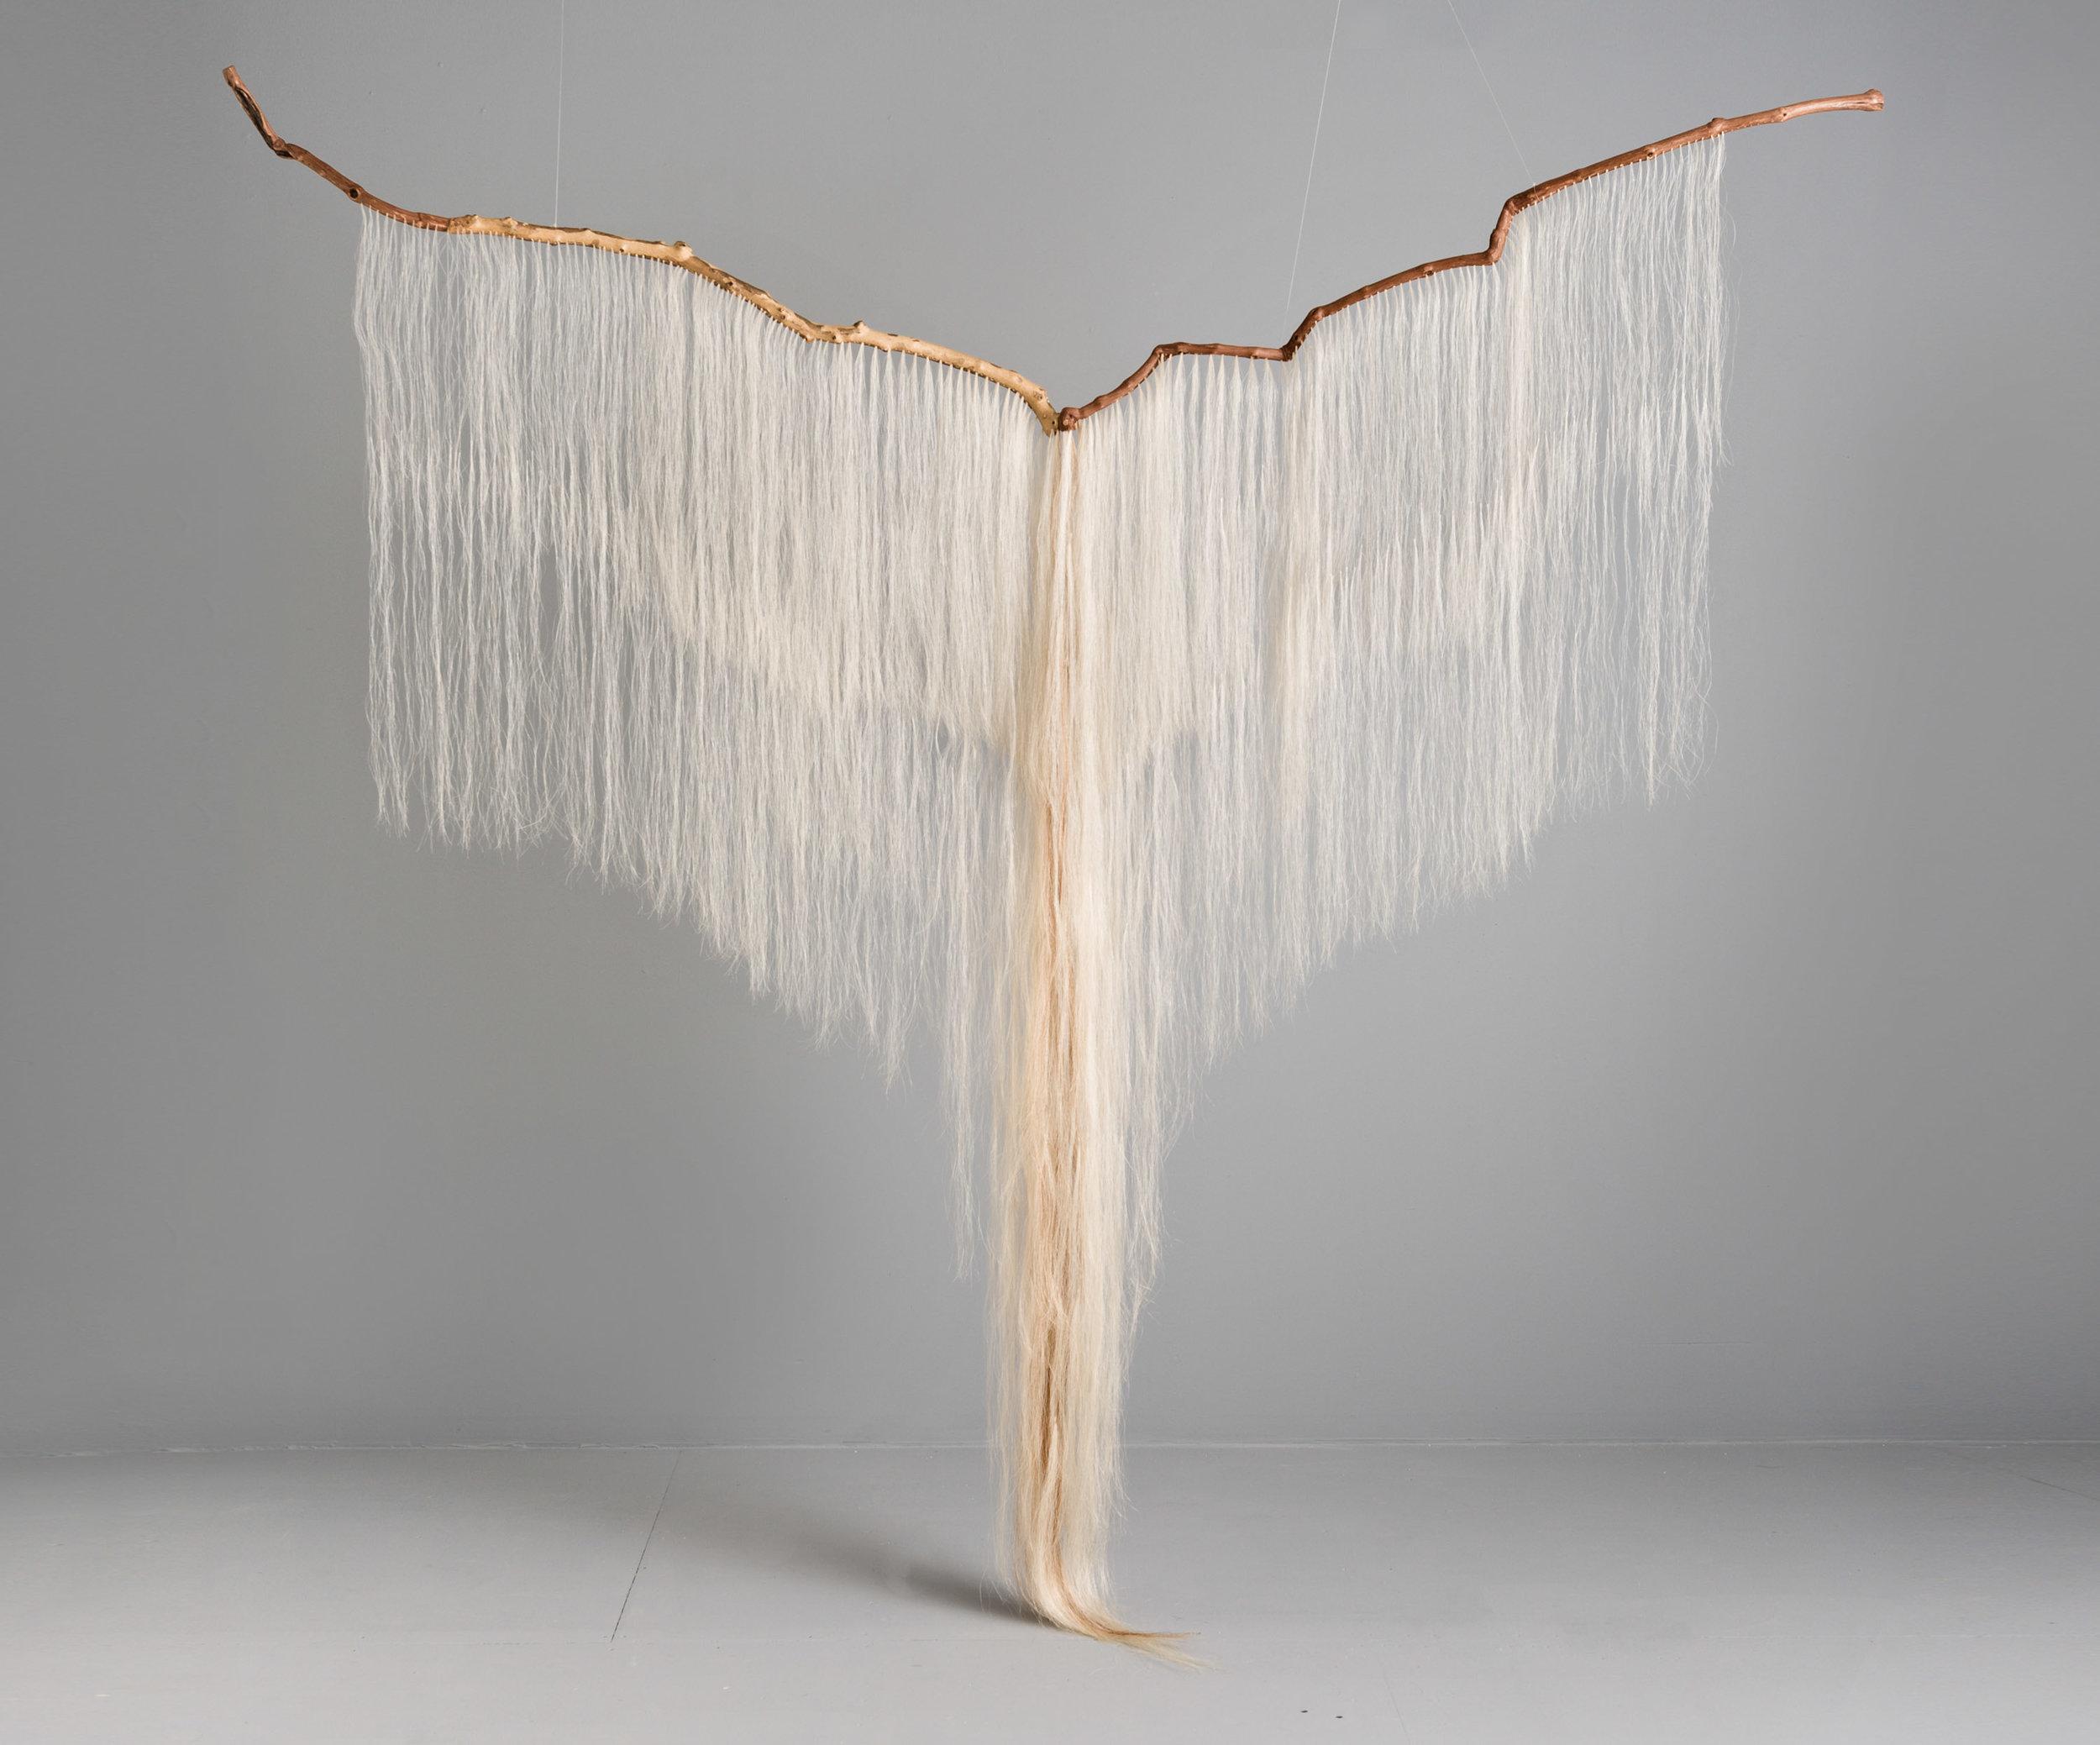 Continuum;  grapevine, sycamore, horse hair; 100 x 103 x 12 inches